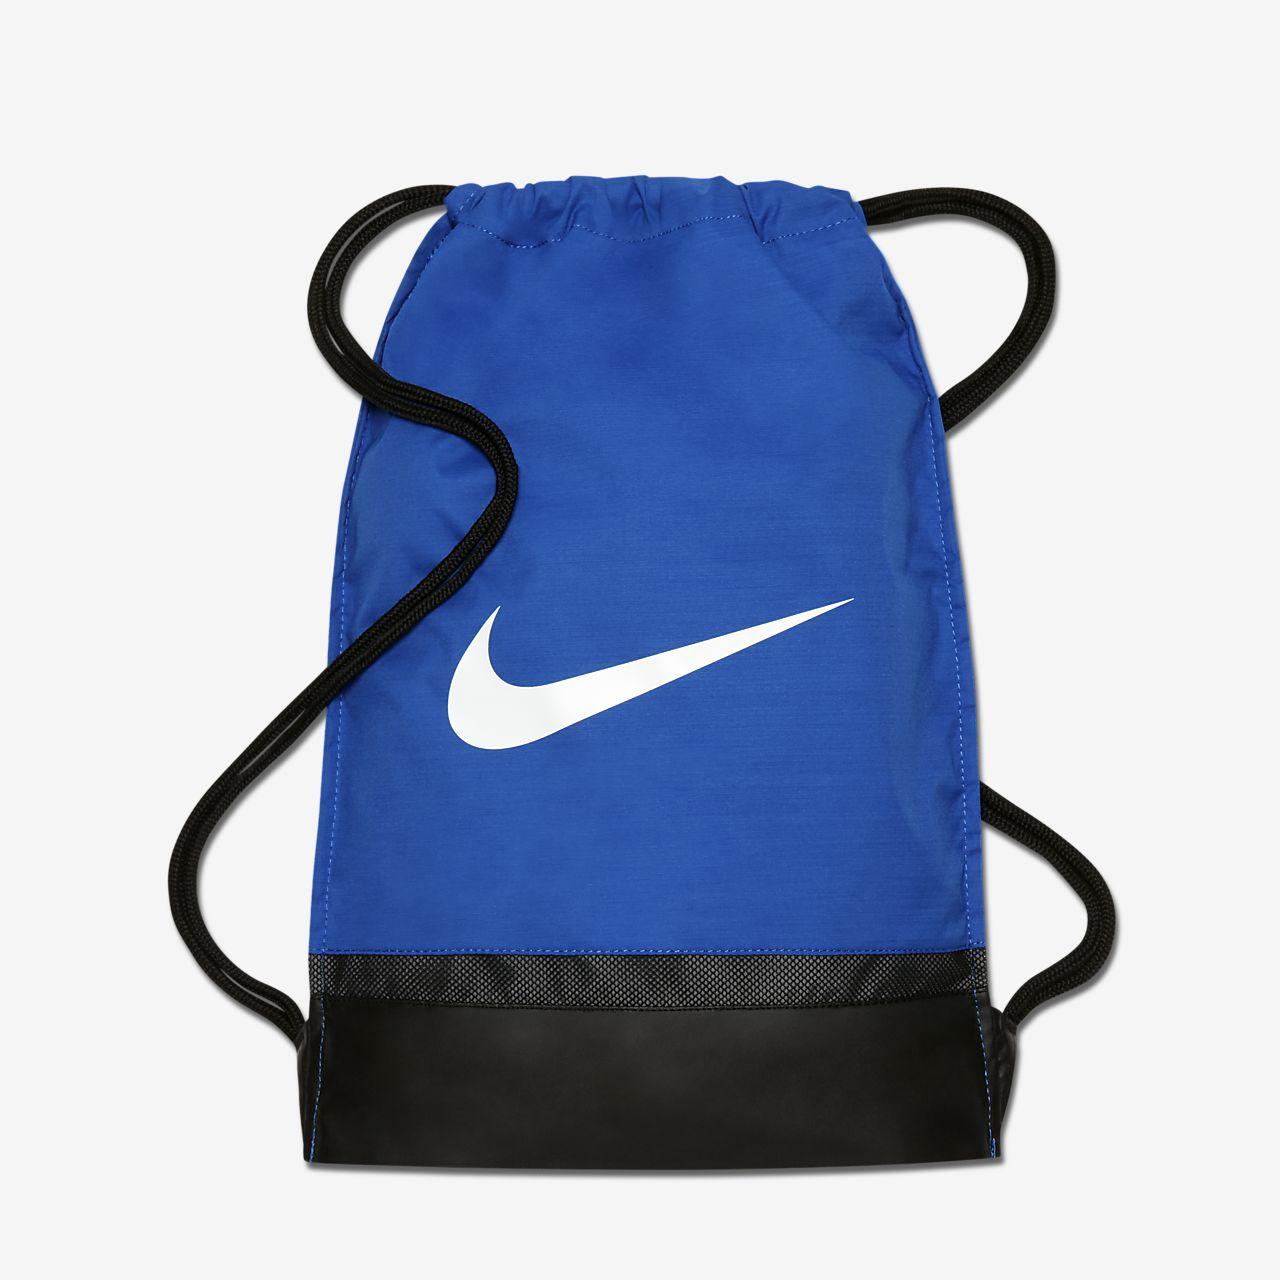 0ccac59de7 Sac de gym pour l'entraînement Nike Brasilia. Nike.com BE